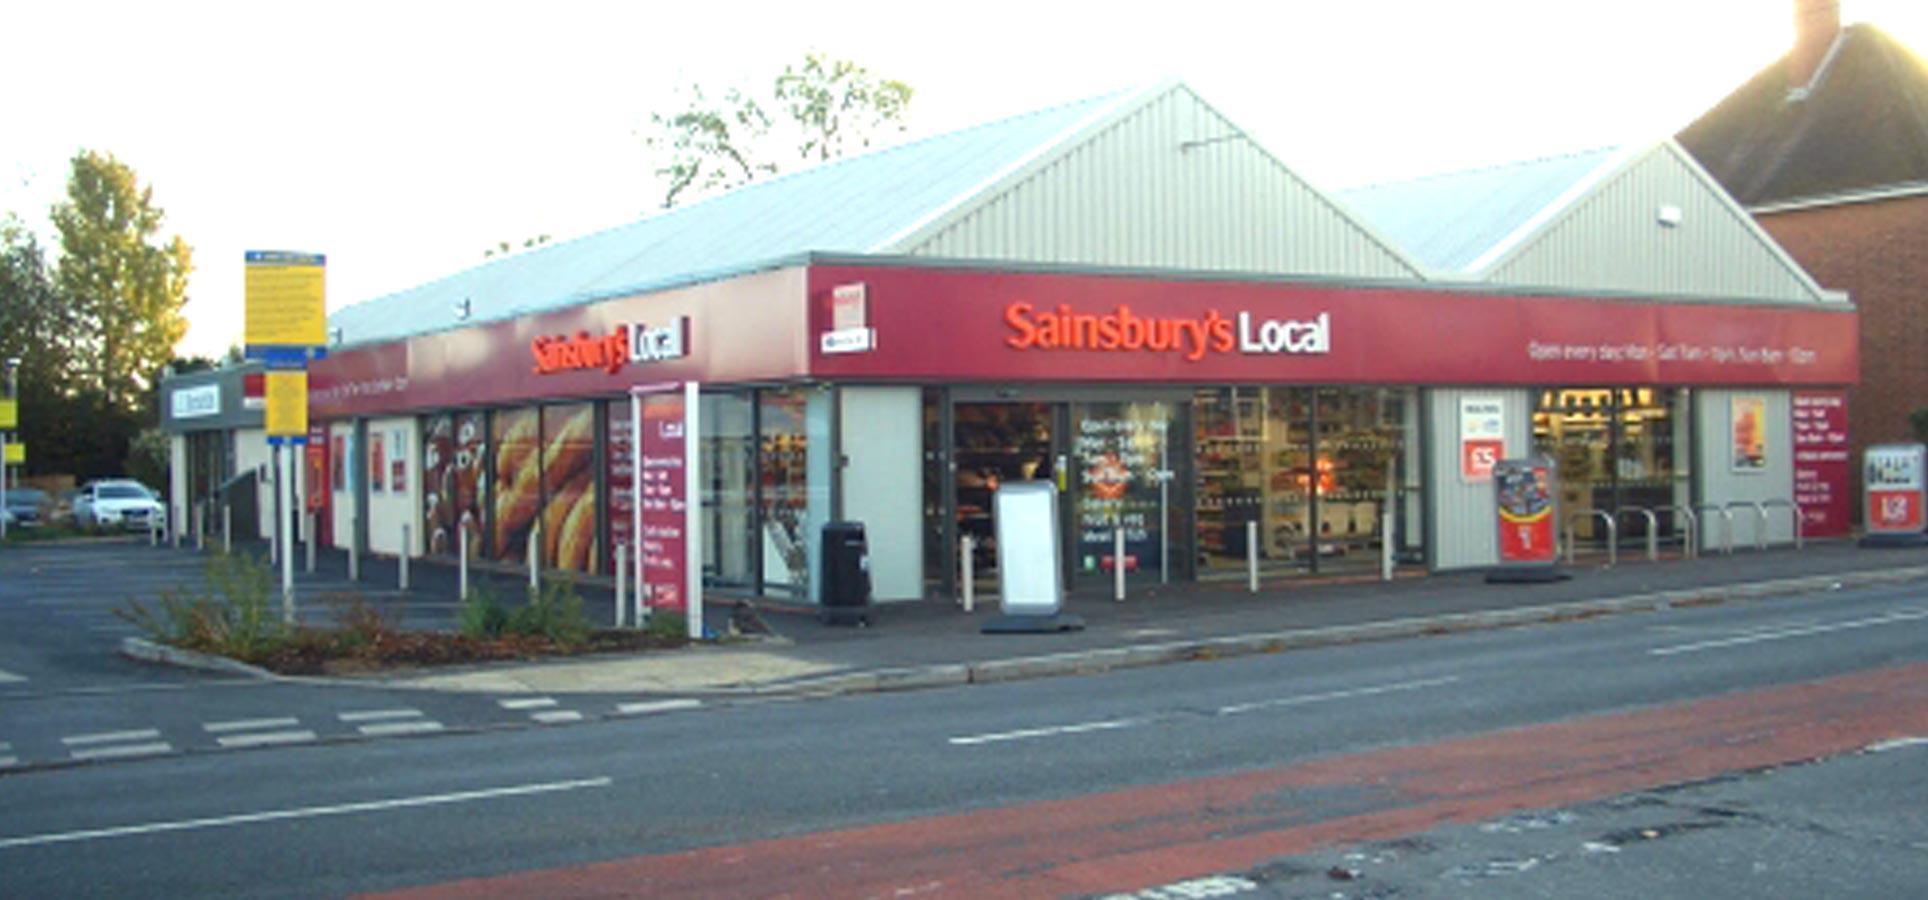 Sainsbury's & Barnardo's, Rugby, Jessops Construction Ltd